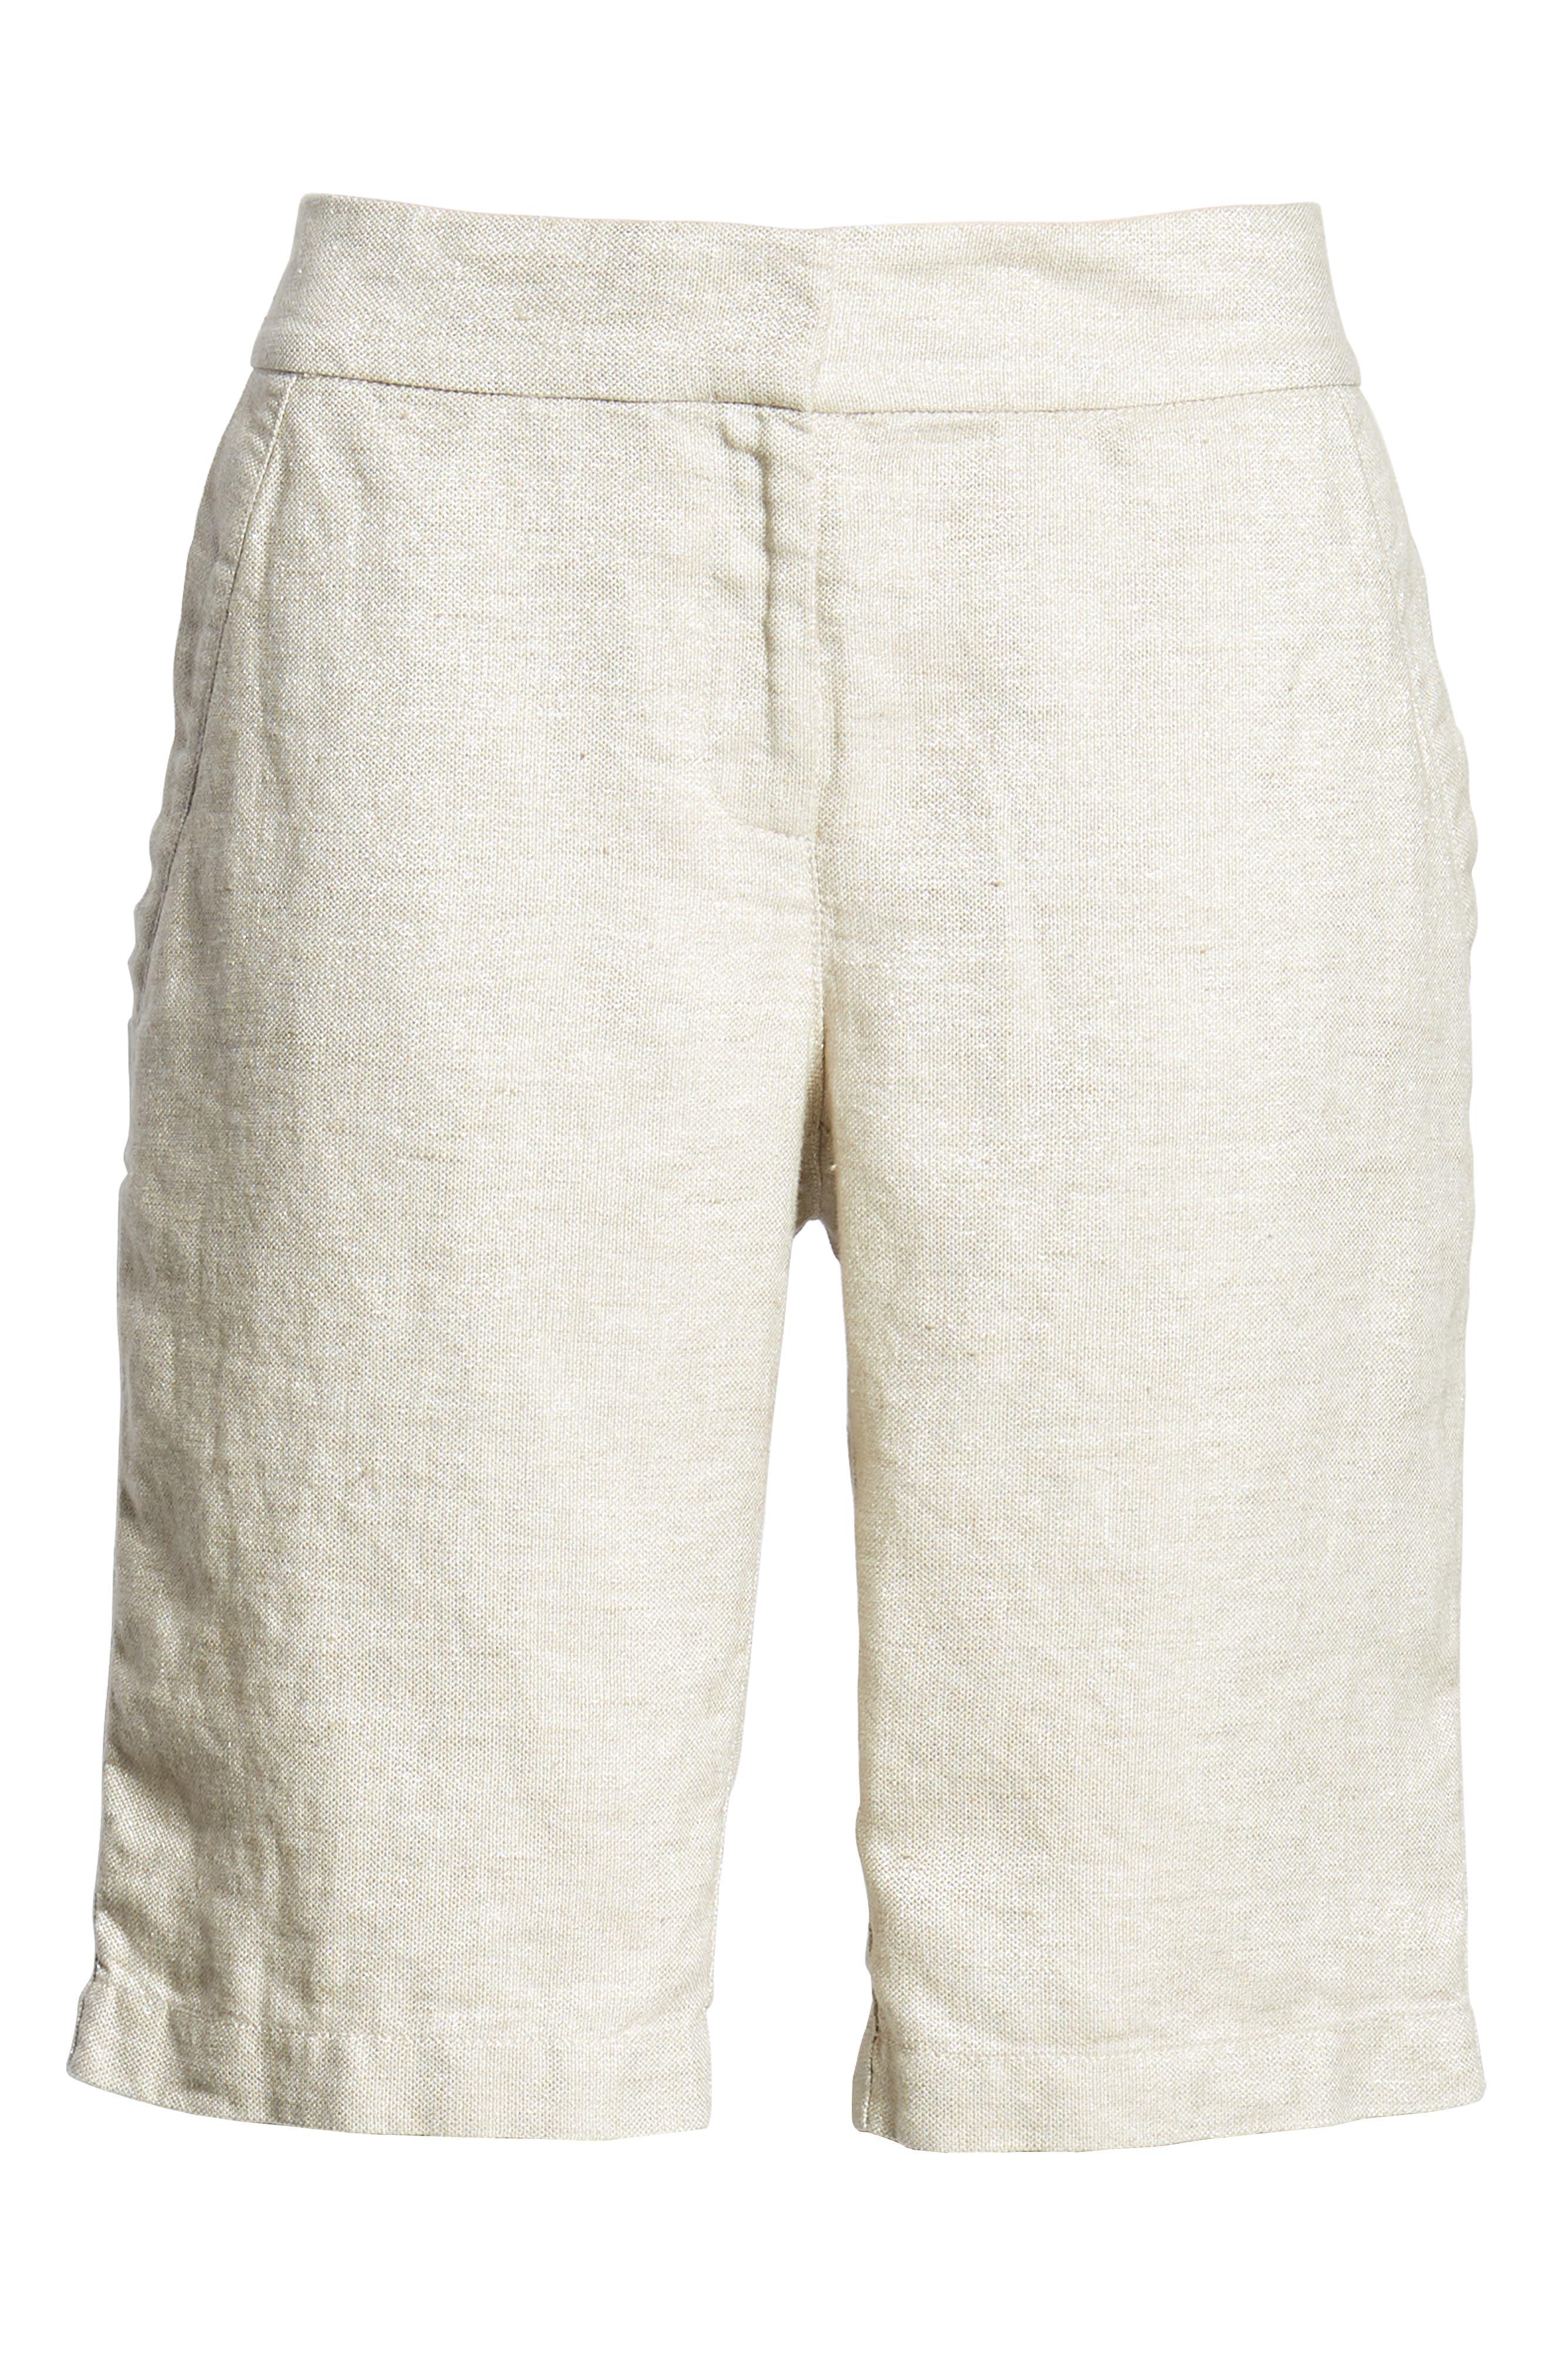 Organic Linen Blend Walking Shorts,                             Alternate thumbnail 6, color,                             257